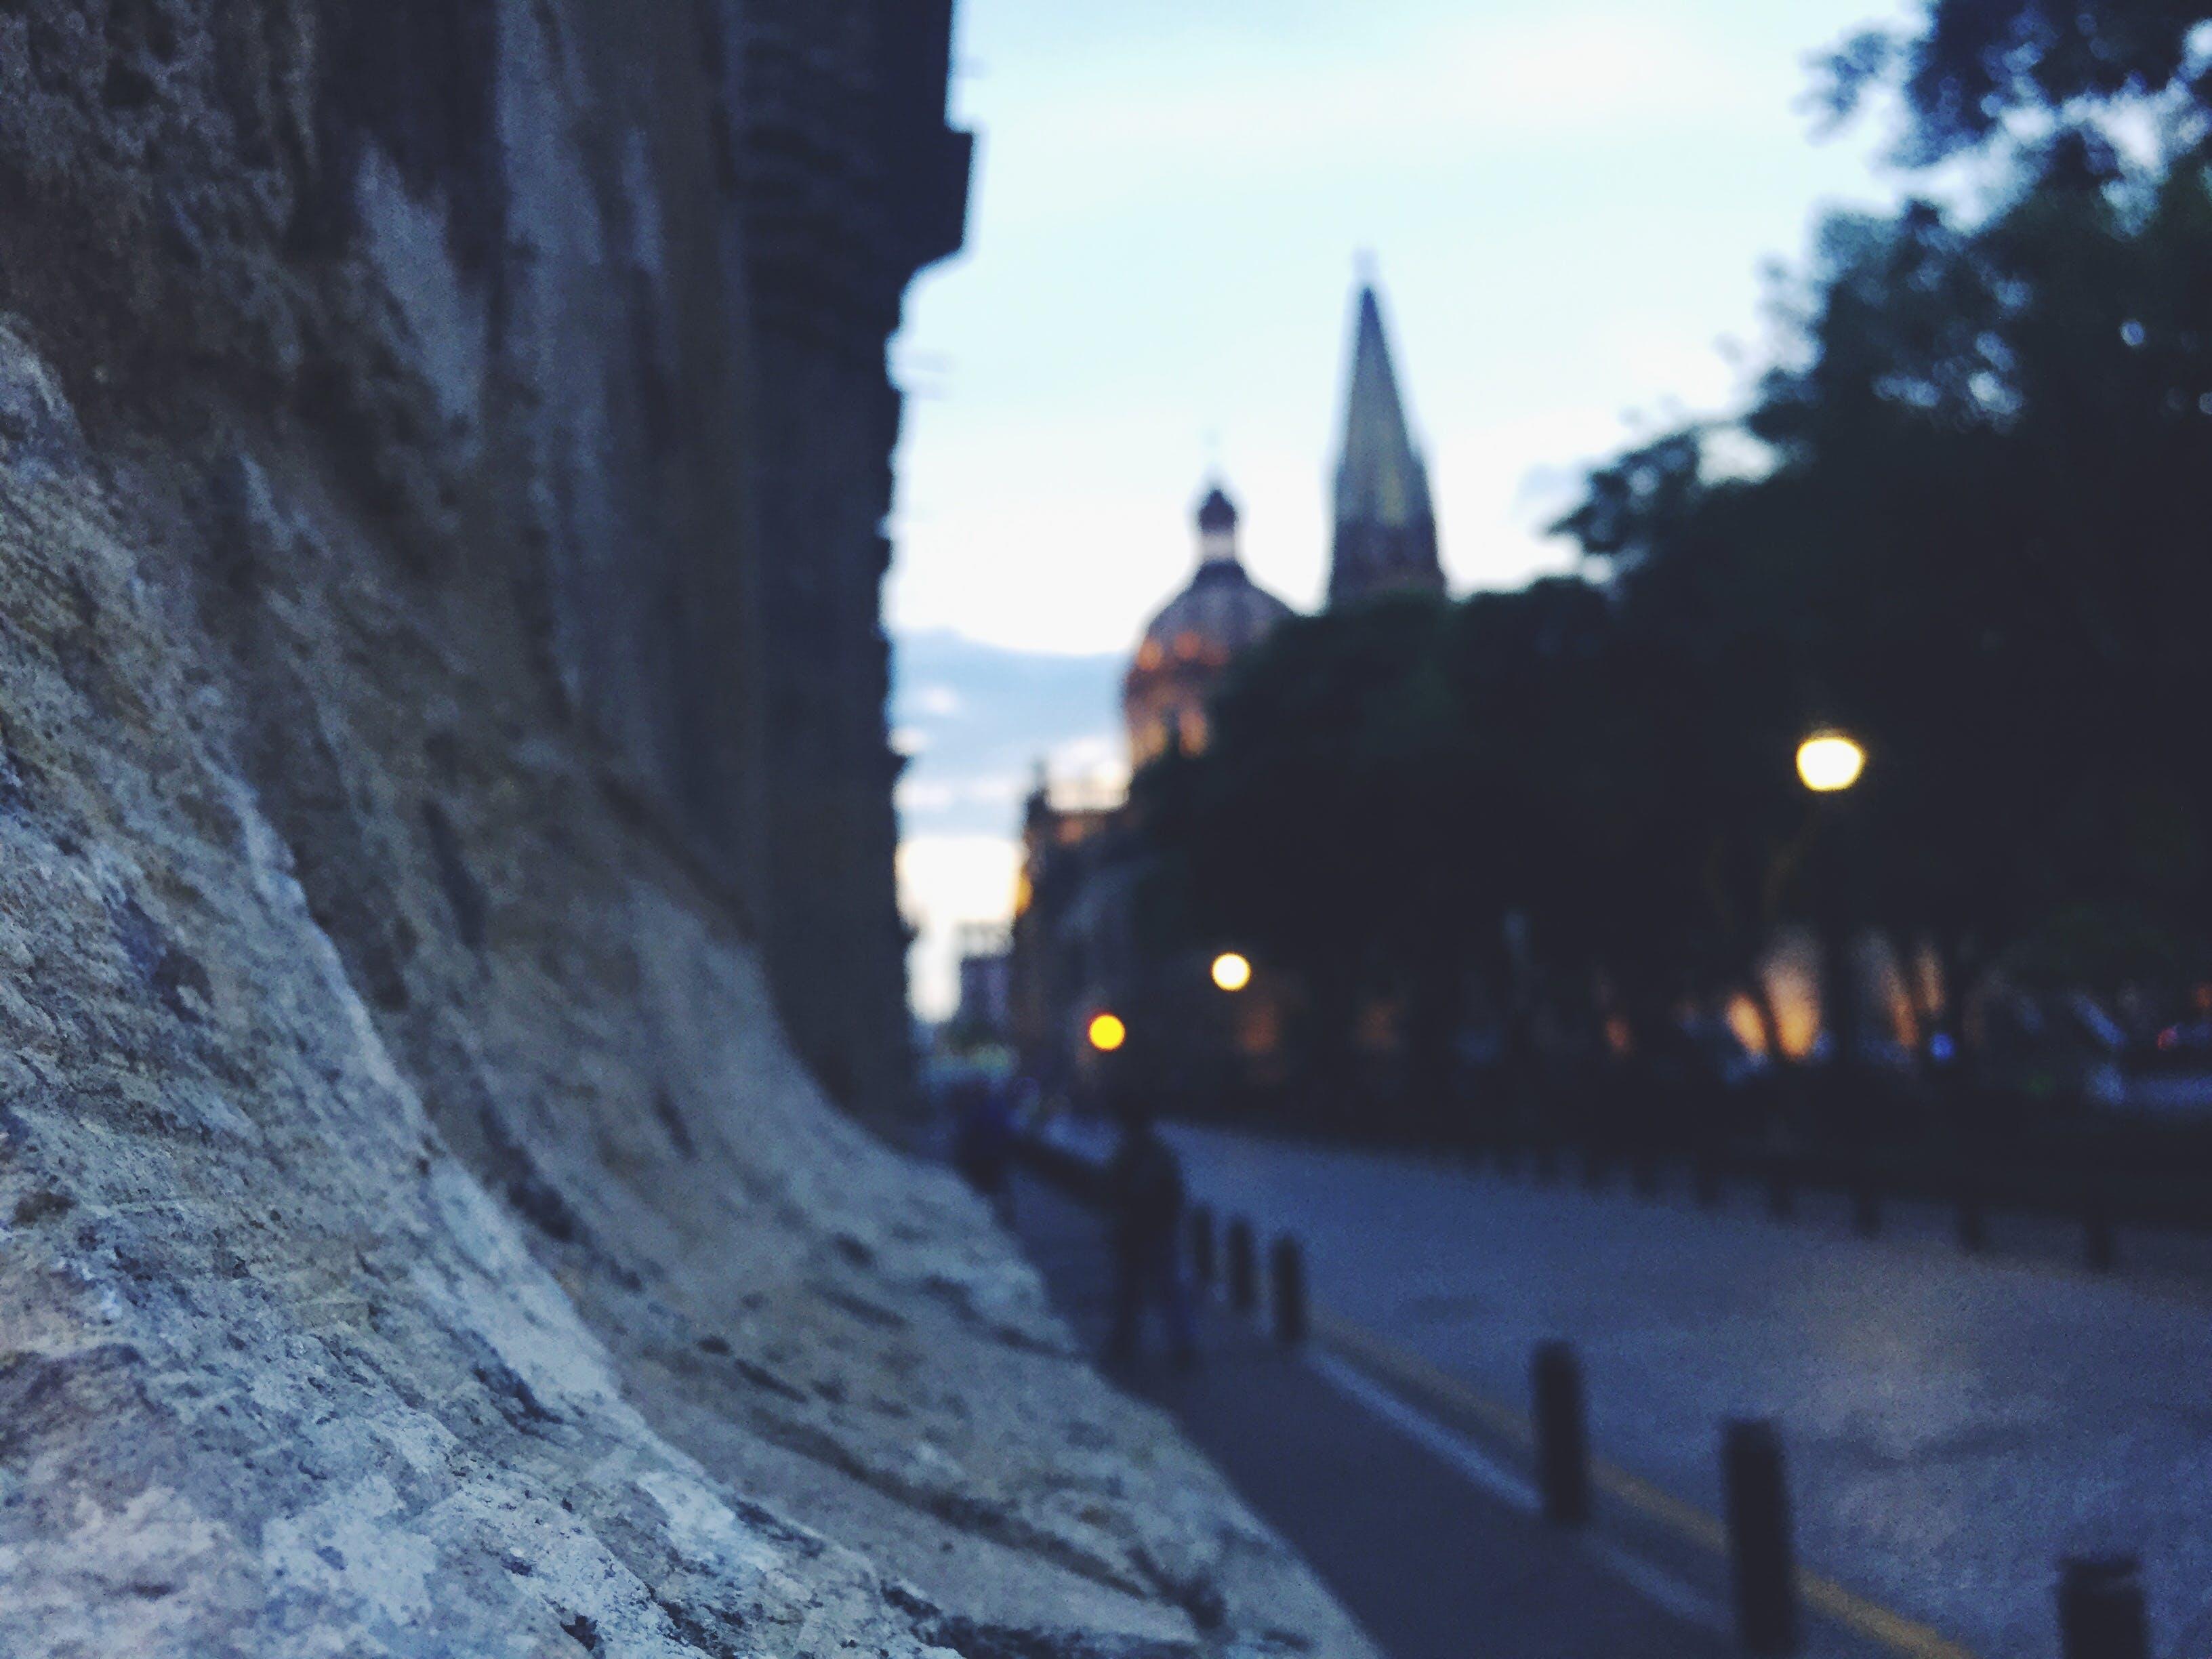 Free stock photo of light, city, road, dawn